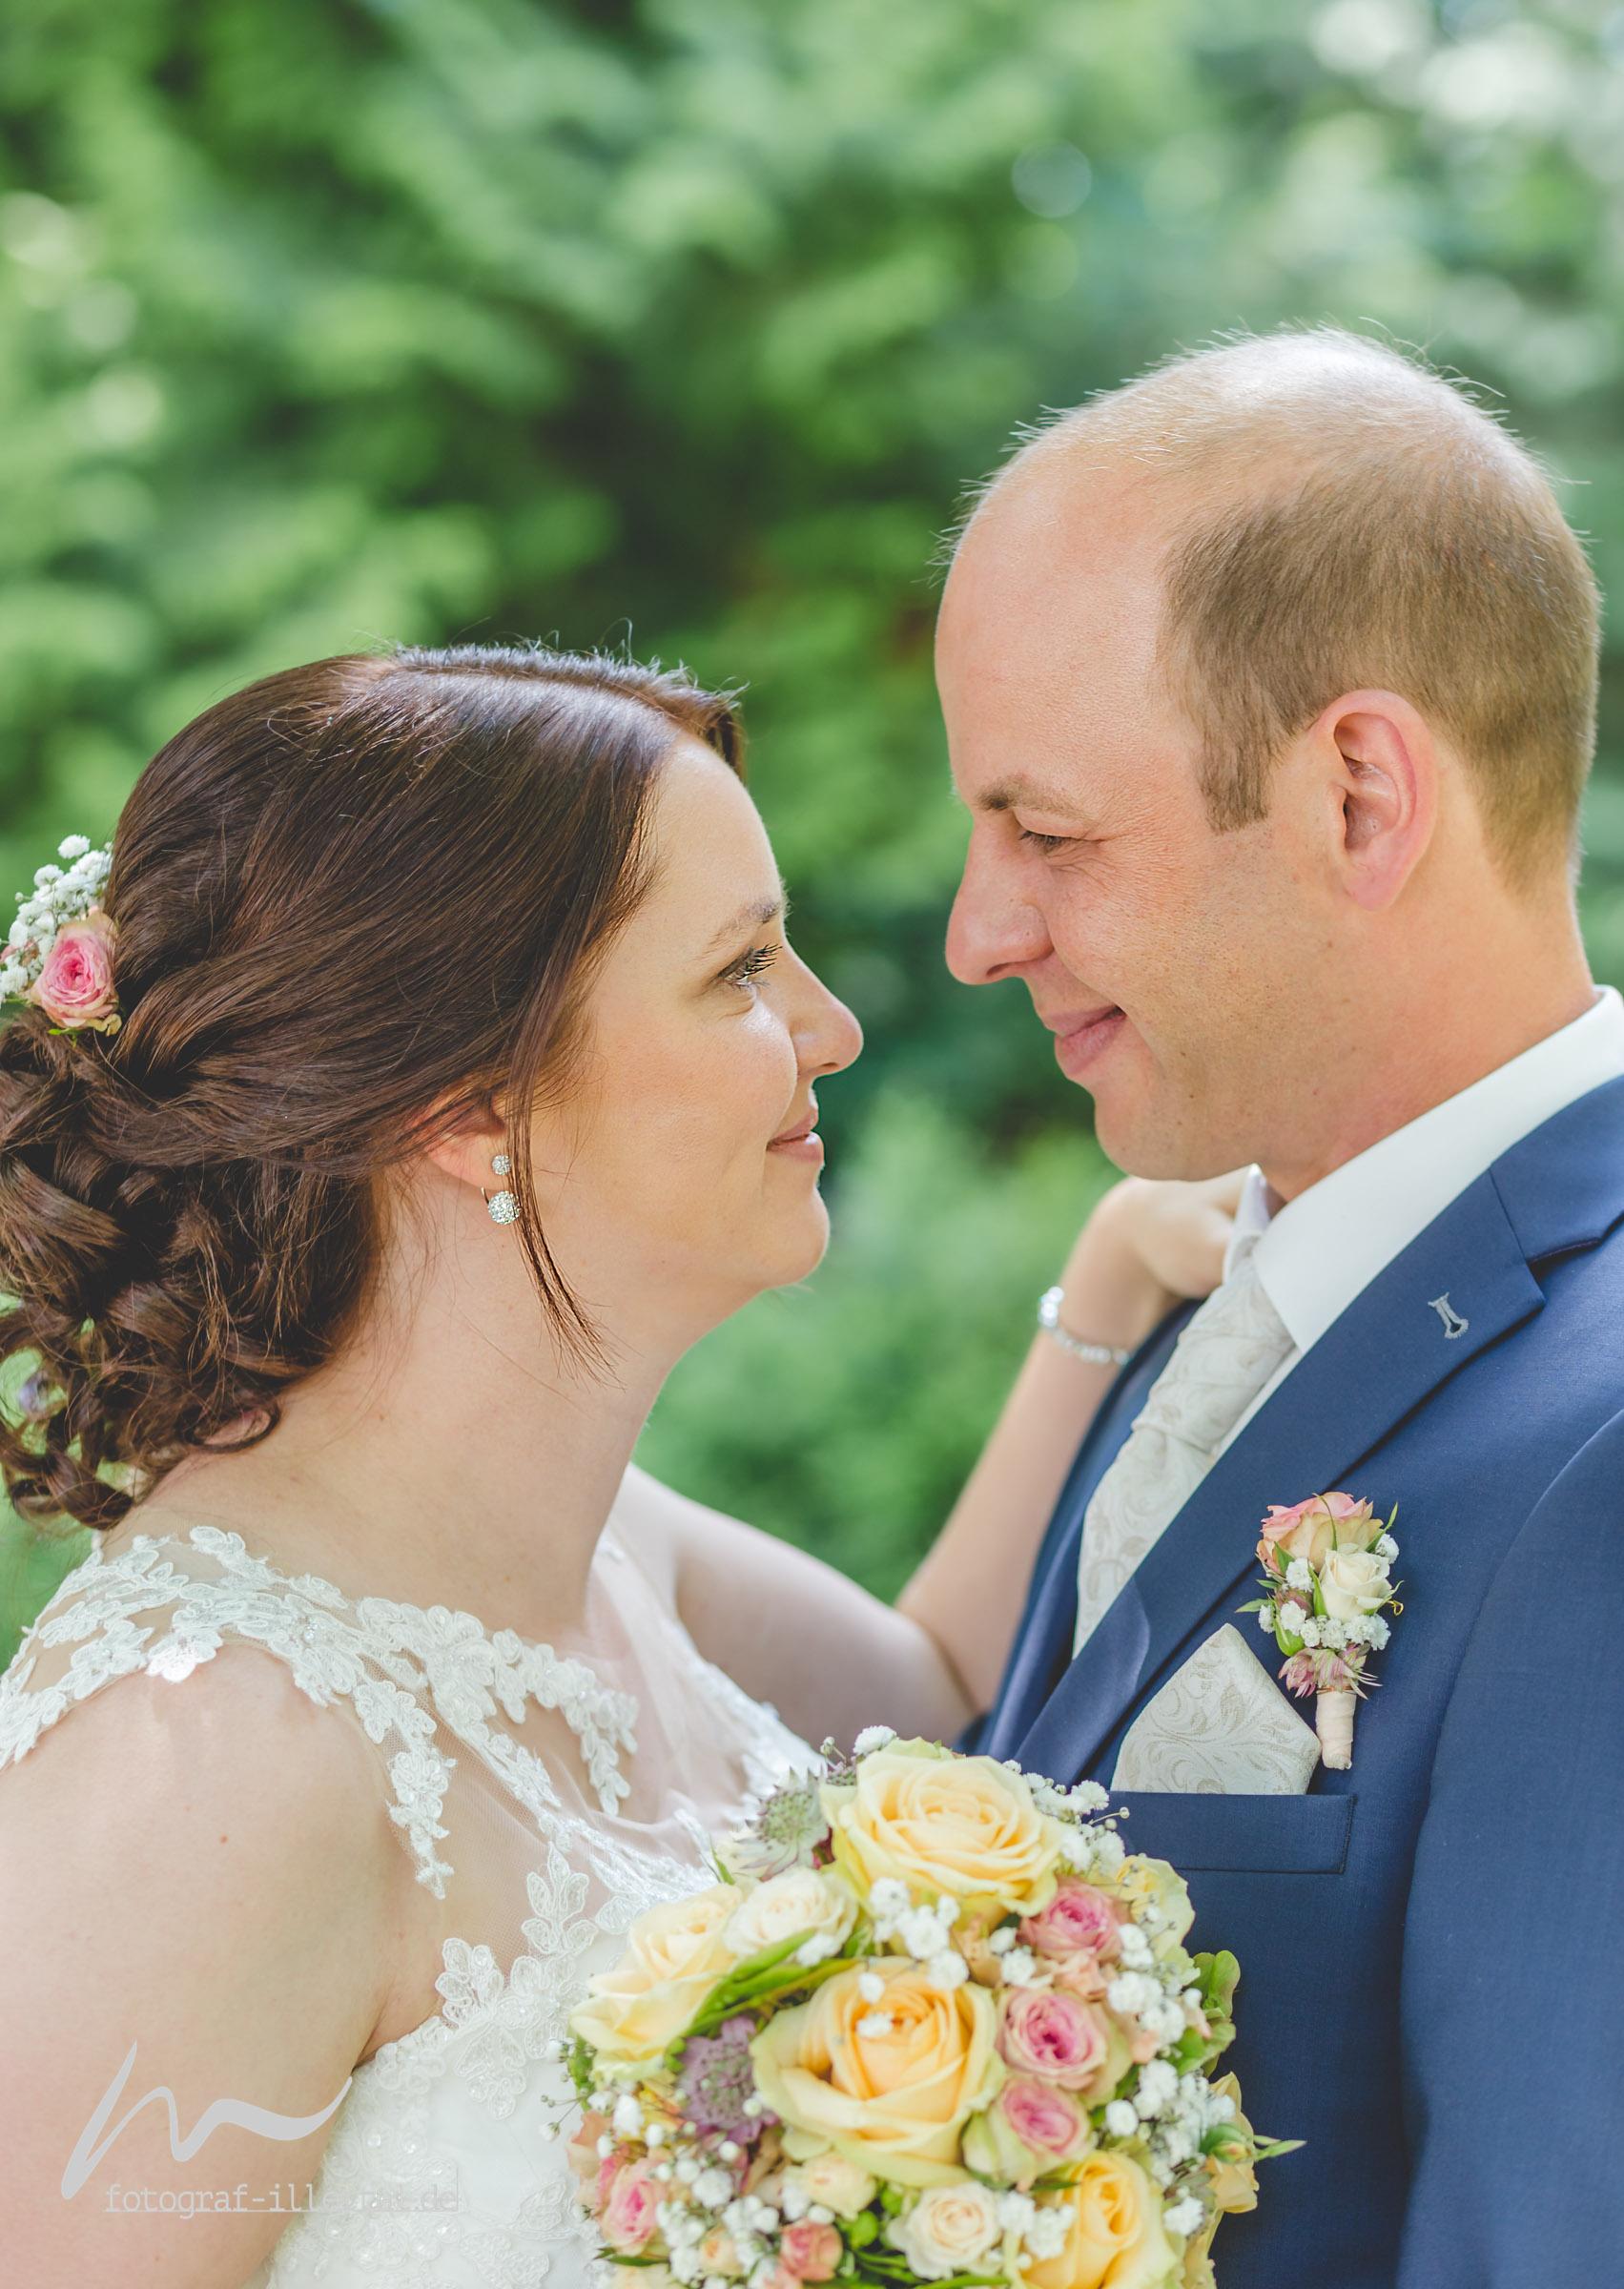 Fotograf Illertal-Christian Miller-Hochzeitsfotografie-_MG_5315